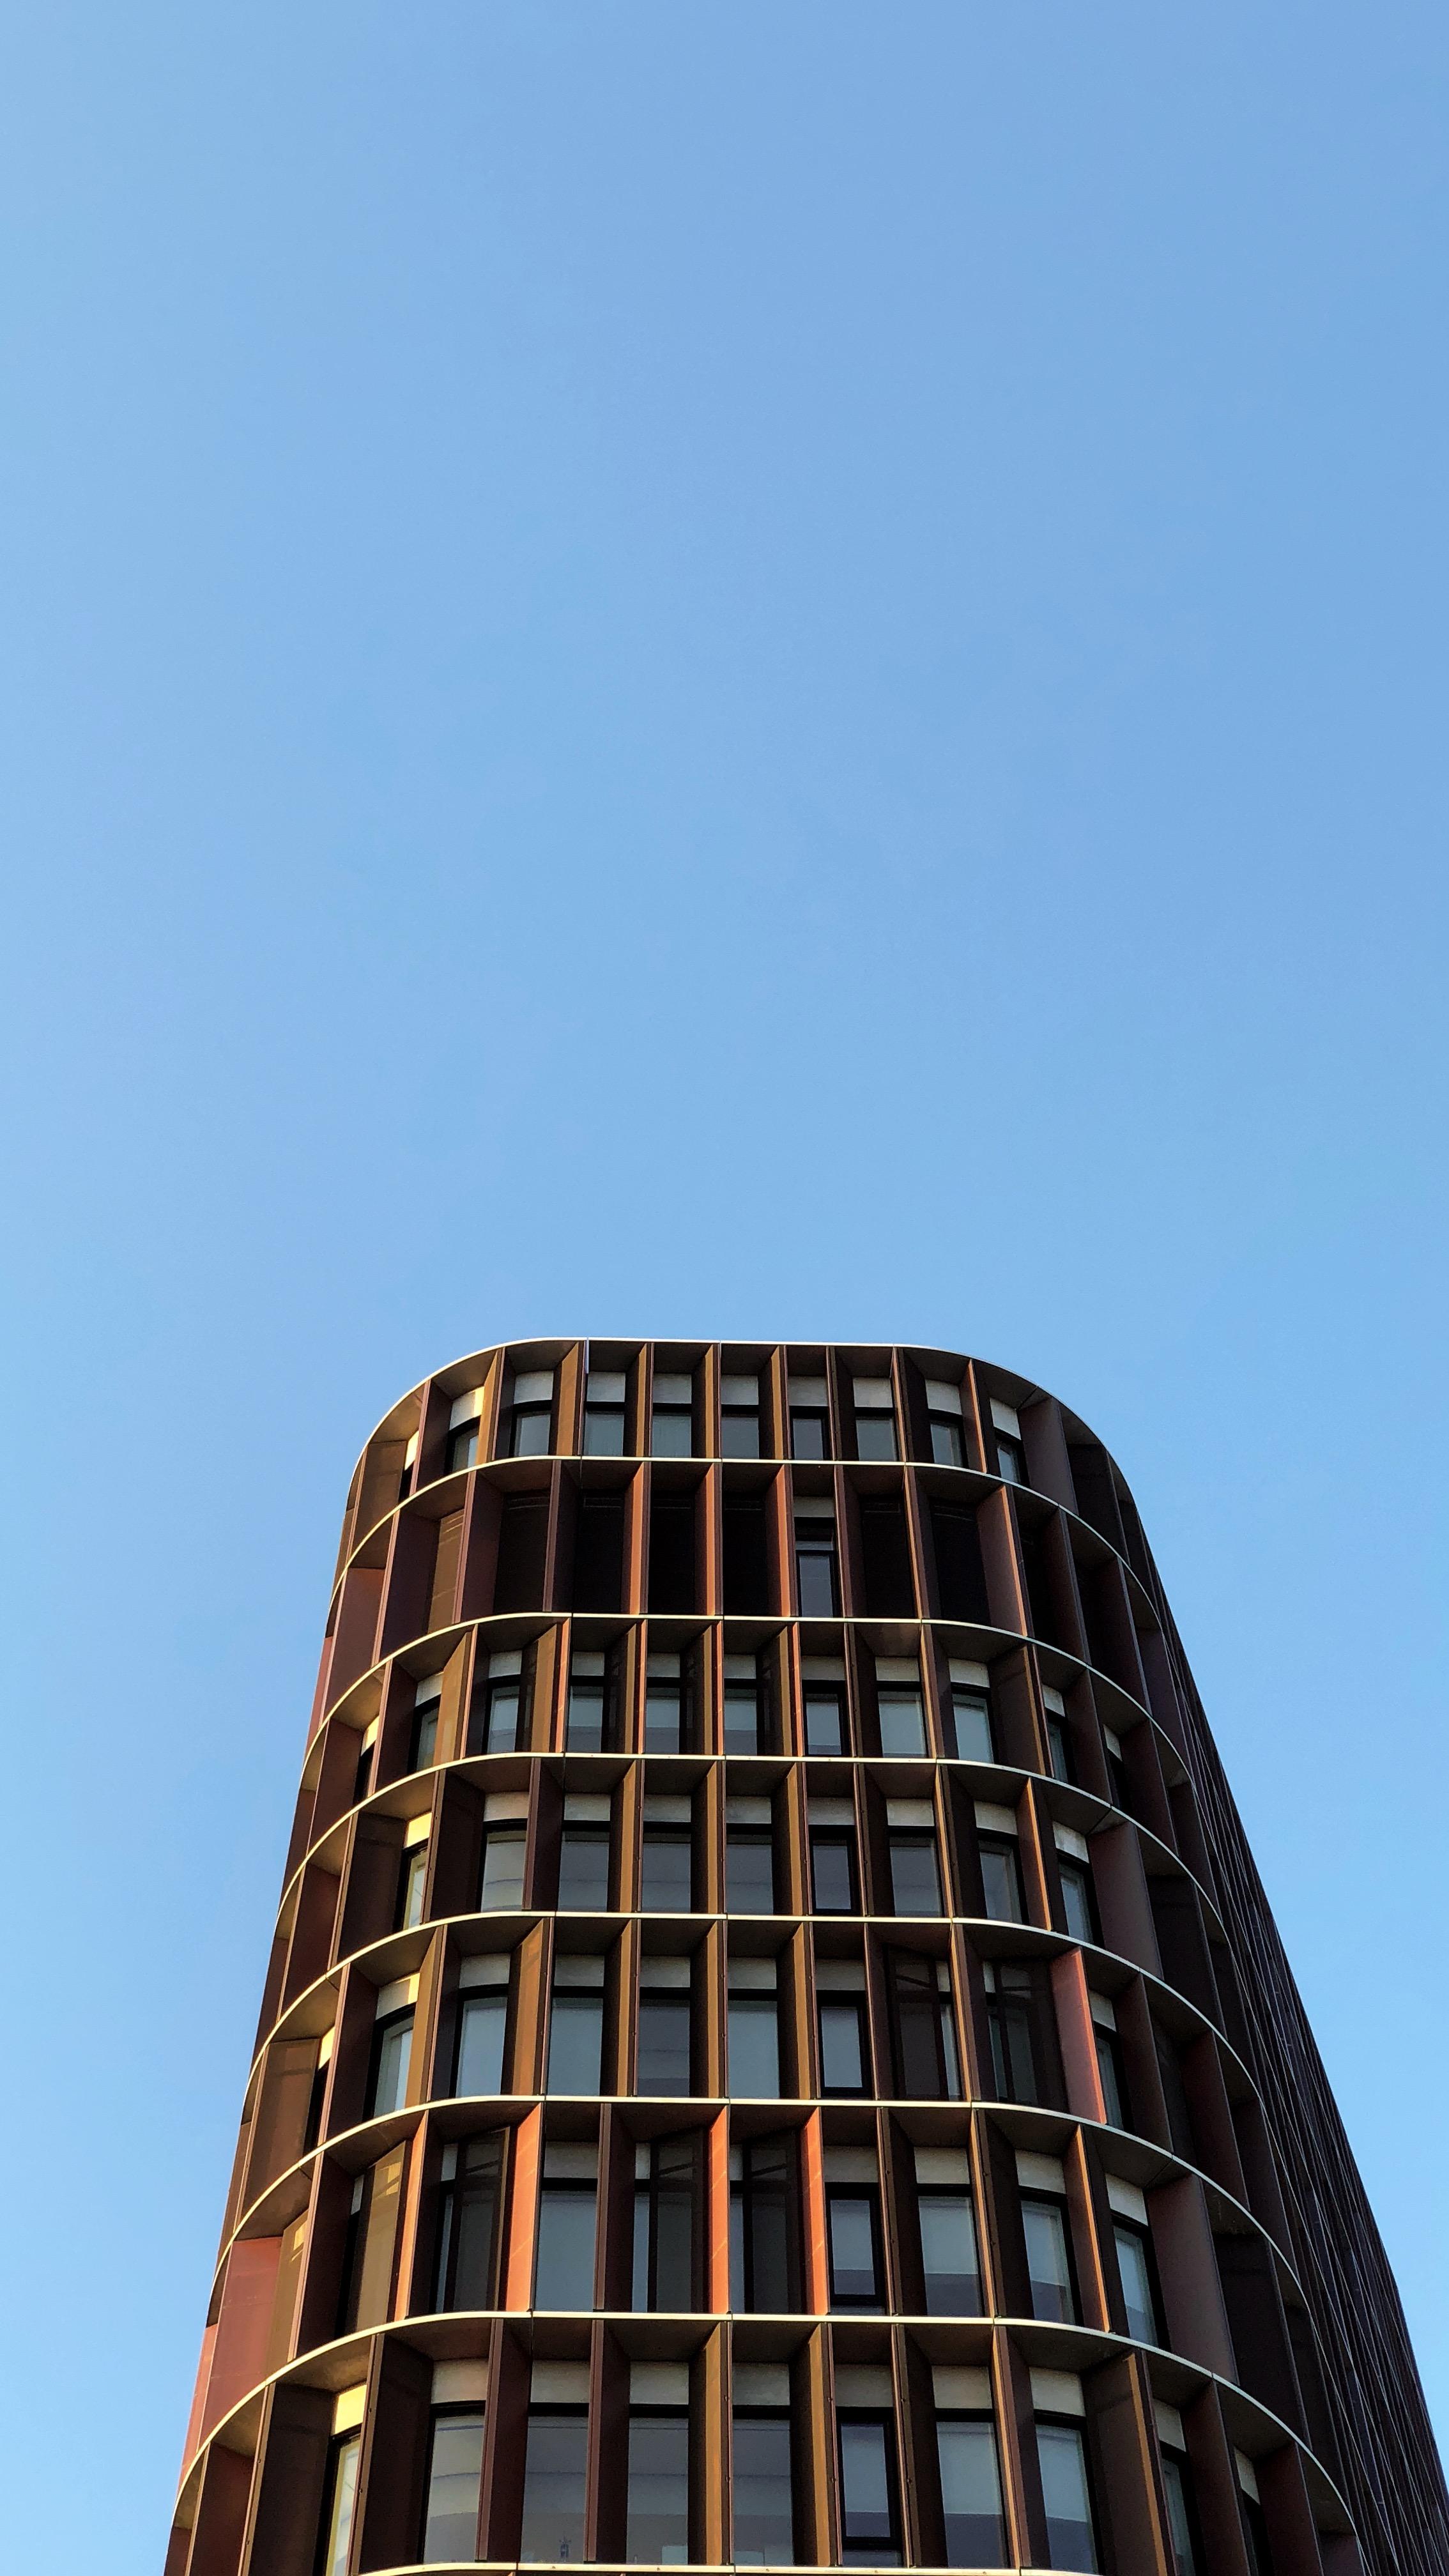 tower-alantherock.jpg